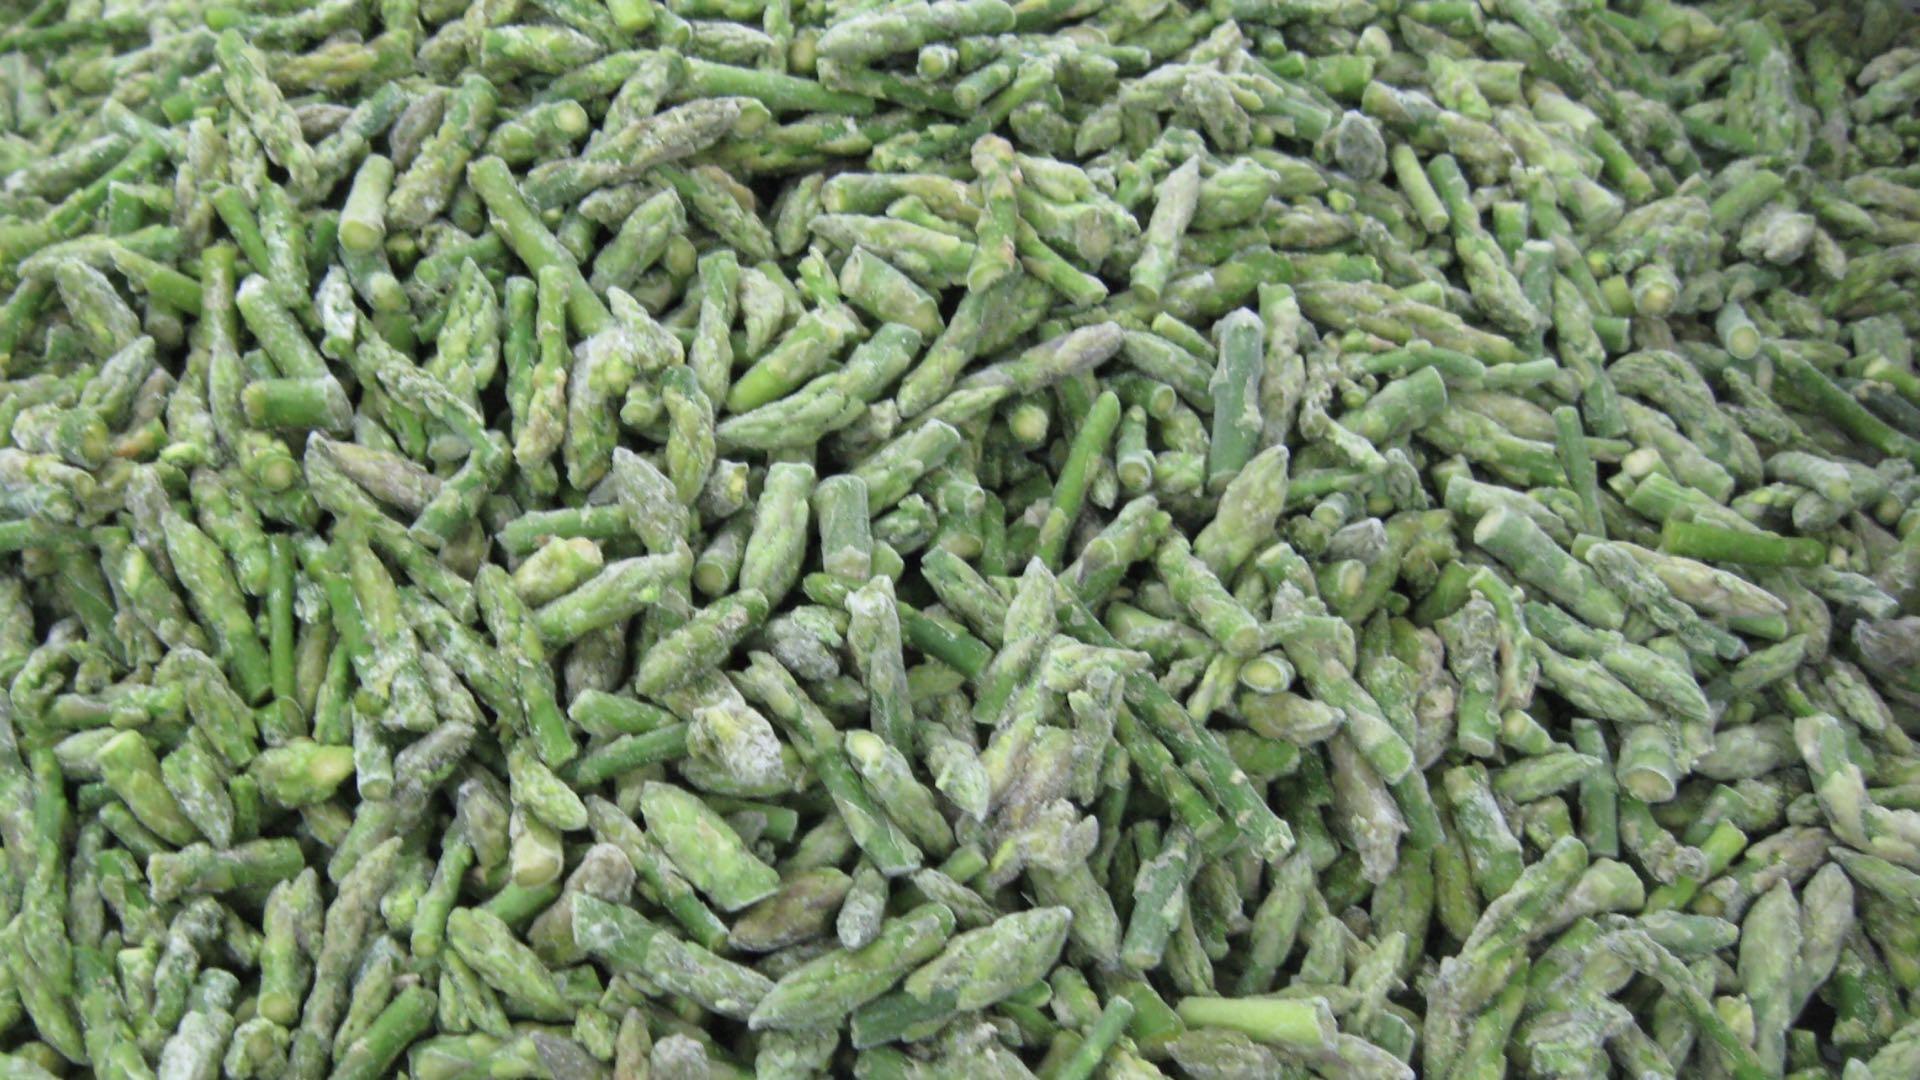 IQF Green Asparagus Cuts & Tips,Frozen Green Asparagus Tips & Cuts 3